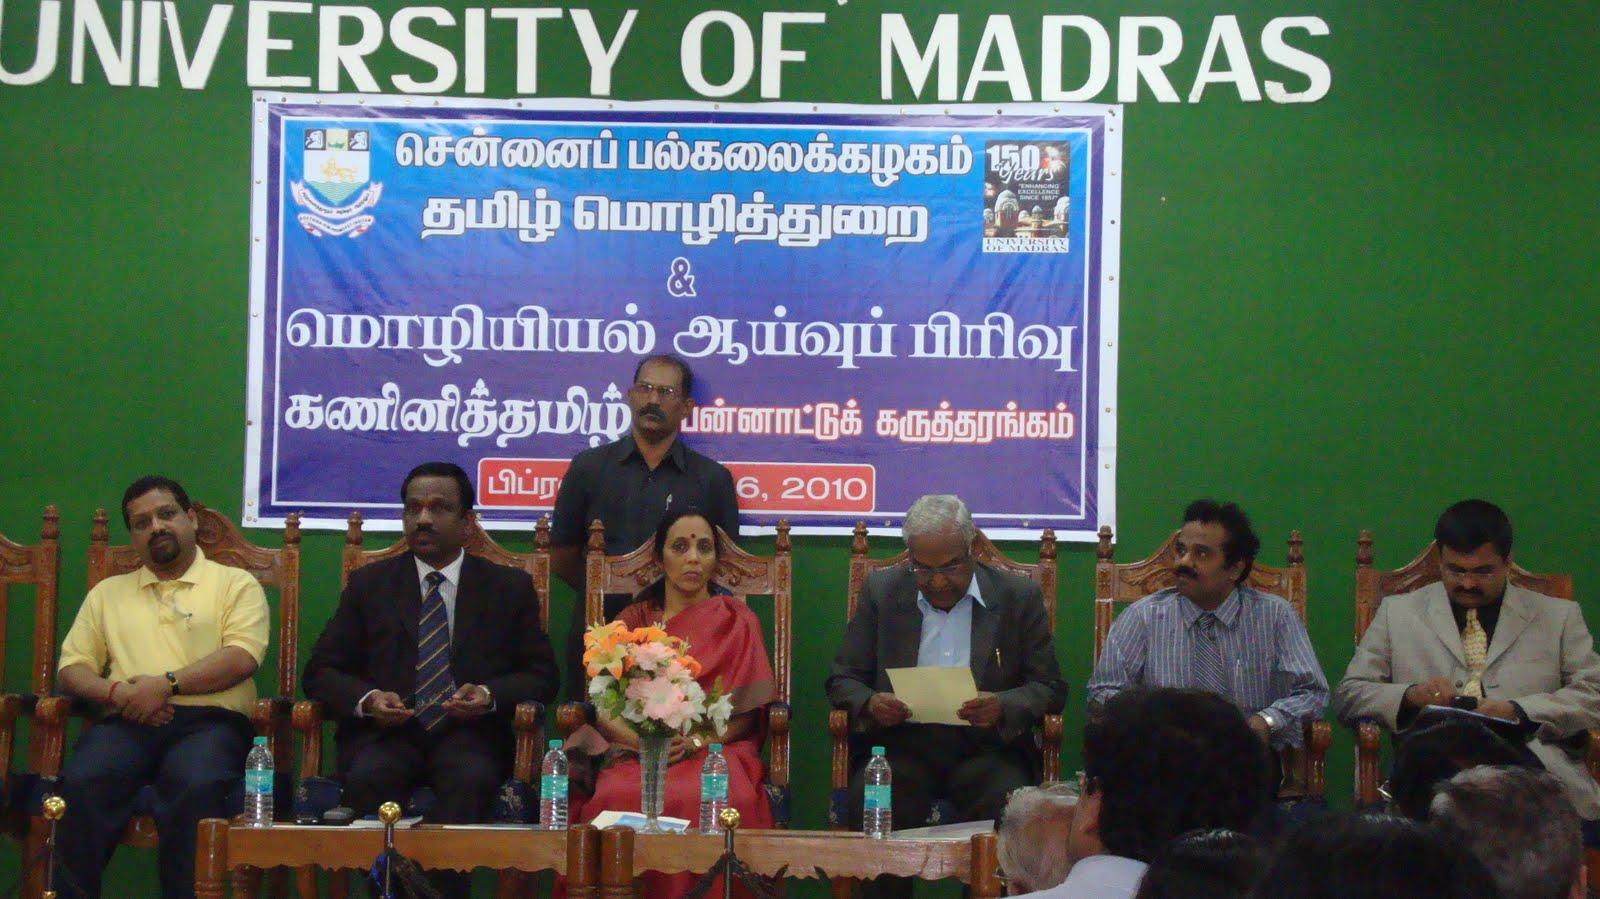 Dr. Niladri Sekhar Dash (Indian Statistical Institute), Col. Dr. G. Thiruvasagam (Vice Chancellor, University of Madras),Dr.Poongothai Aladi Aruna (Minister for Information Technology, Tamilnadu Government),Prof.M.Anandakrishnan (Chairman, IIT Kanpur), Dr.A.R. Sivakumaran (Professor, Nanyang Technological University, Singapore),T.N.C.Venkata Rangan (Chair, INFITT)